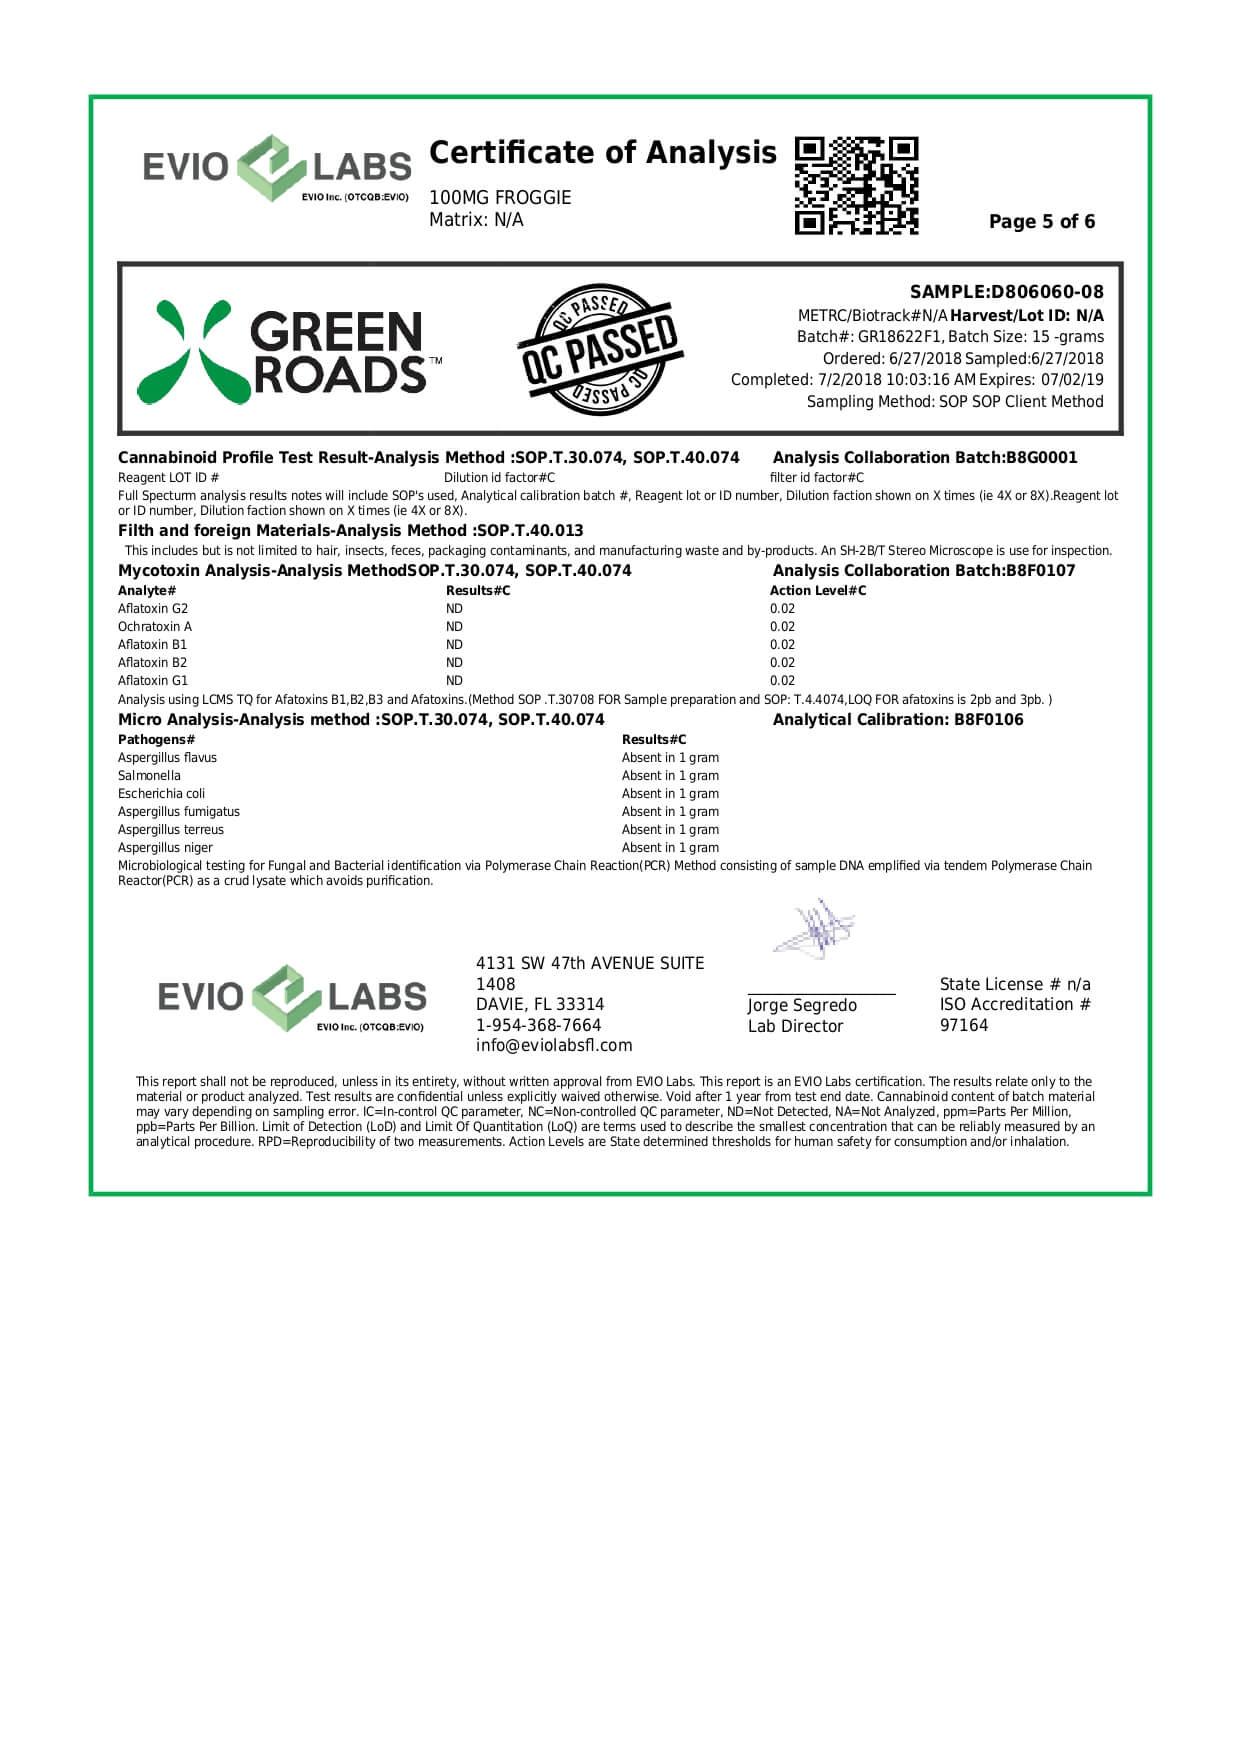 Green Roads CBD Edible Froggies 100mg Lab Report